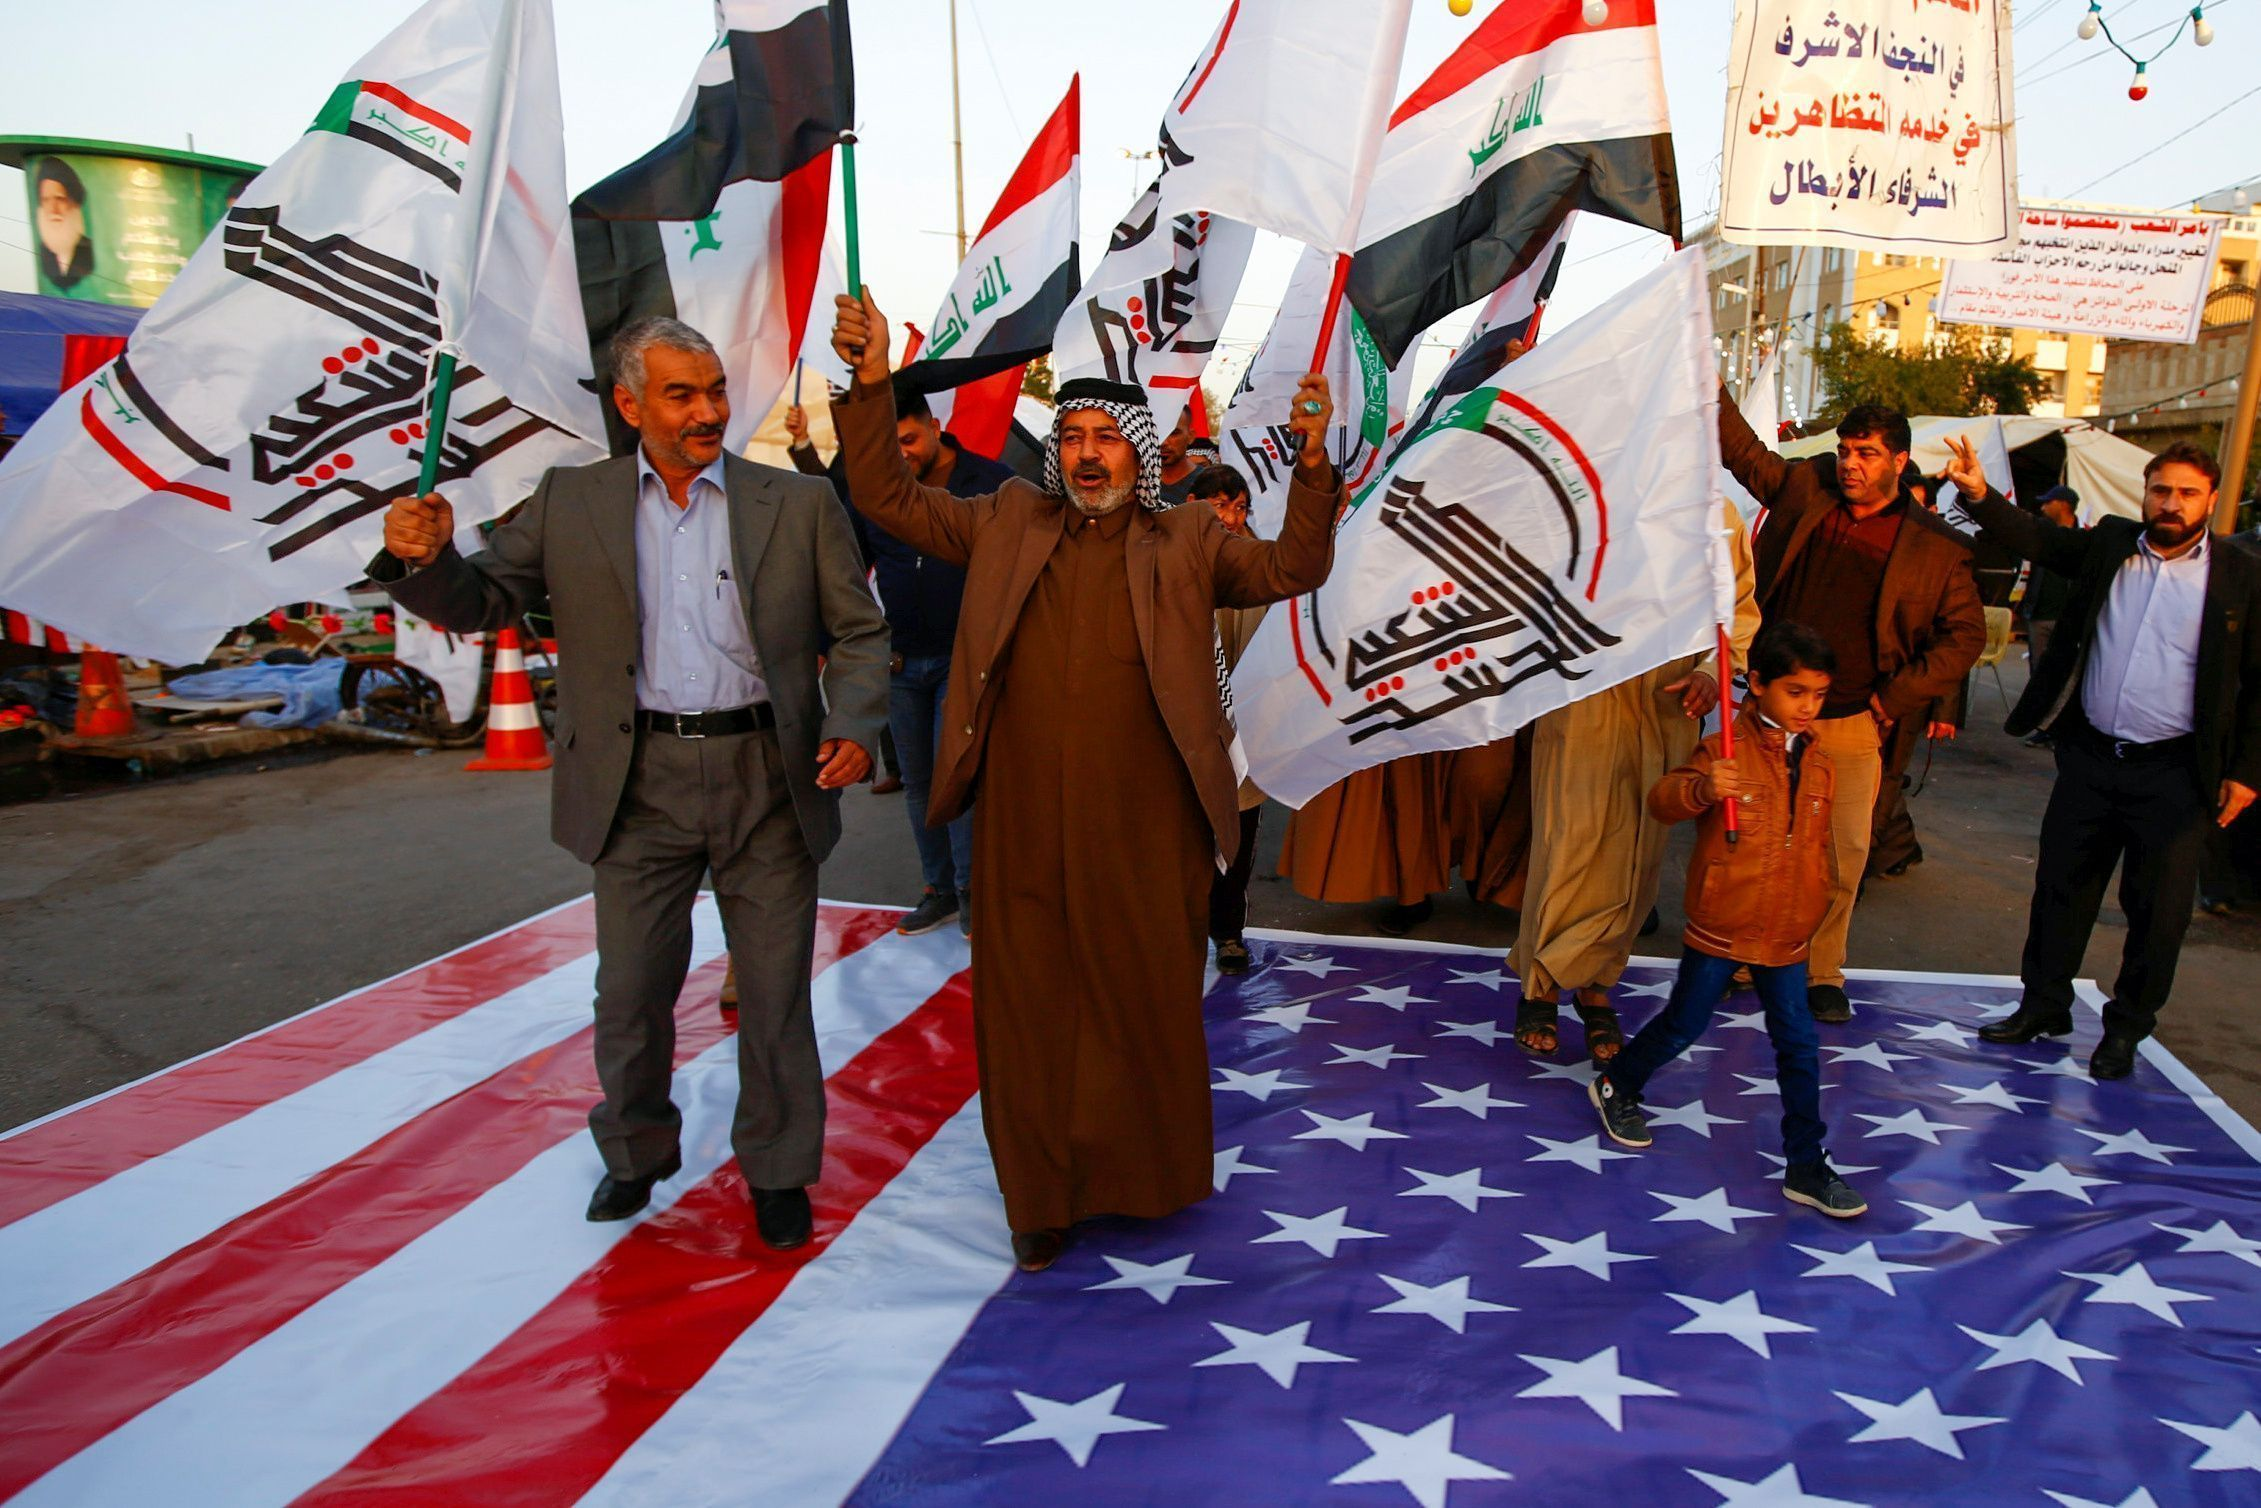 2019-12-30T143631Z_1567966489_RC2Q5E9X7DV4_RTRMADP_3_IRAQ-SECURITY-USA